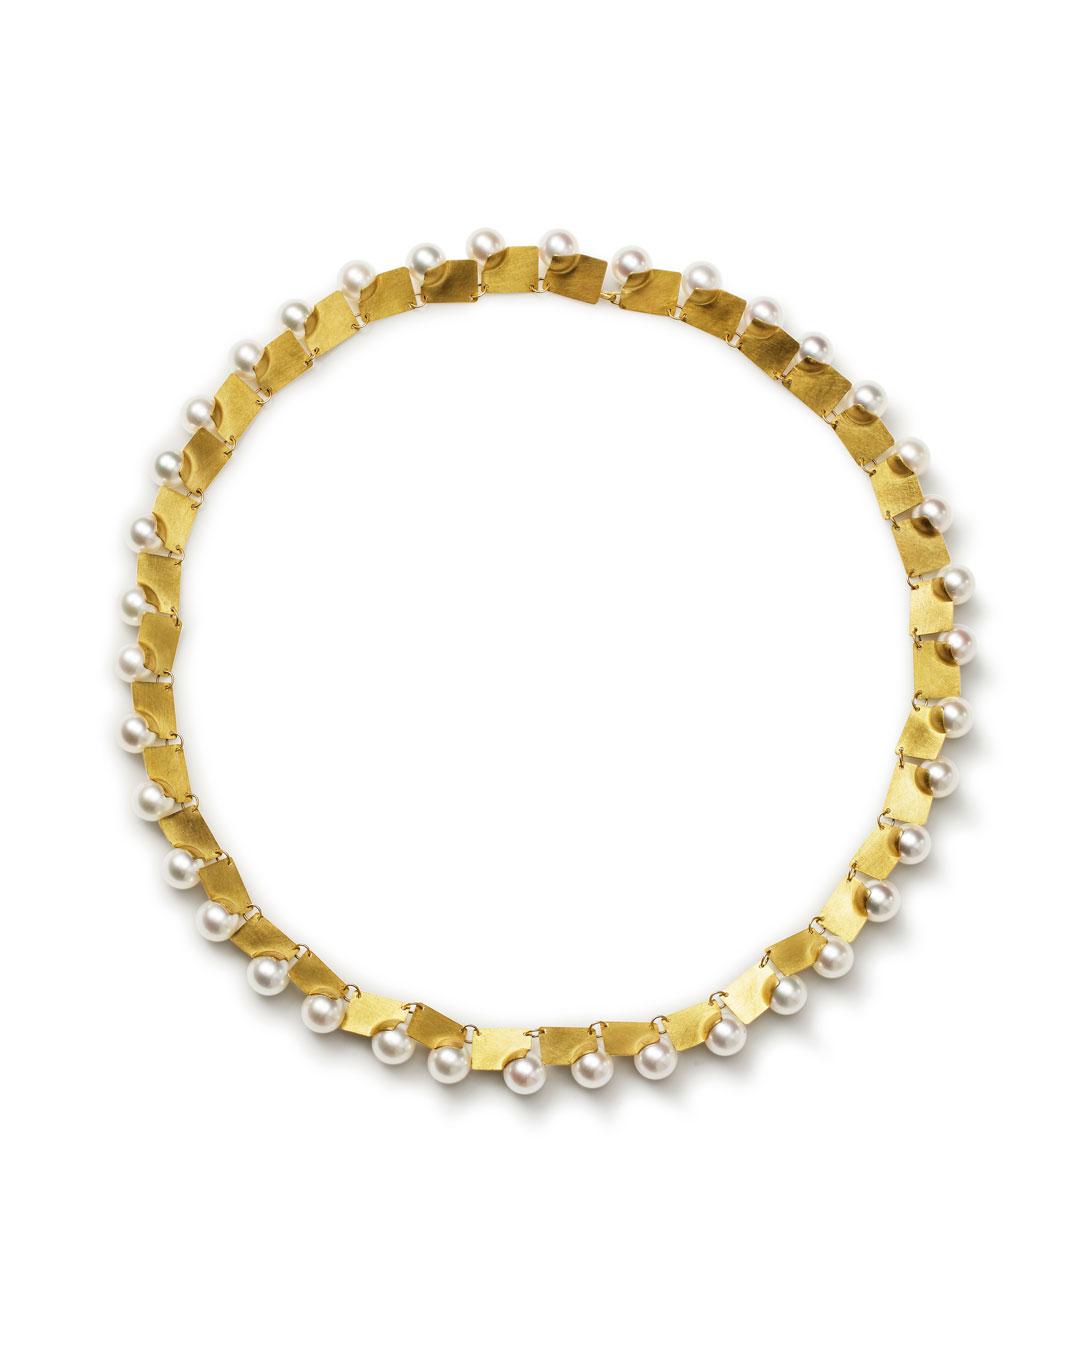 Etsuko Sonobe, untitled, 2013, necklace; 20ct gold, pearls, 520 x 12 x 7 mm, €5900